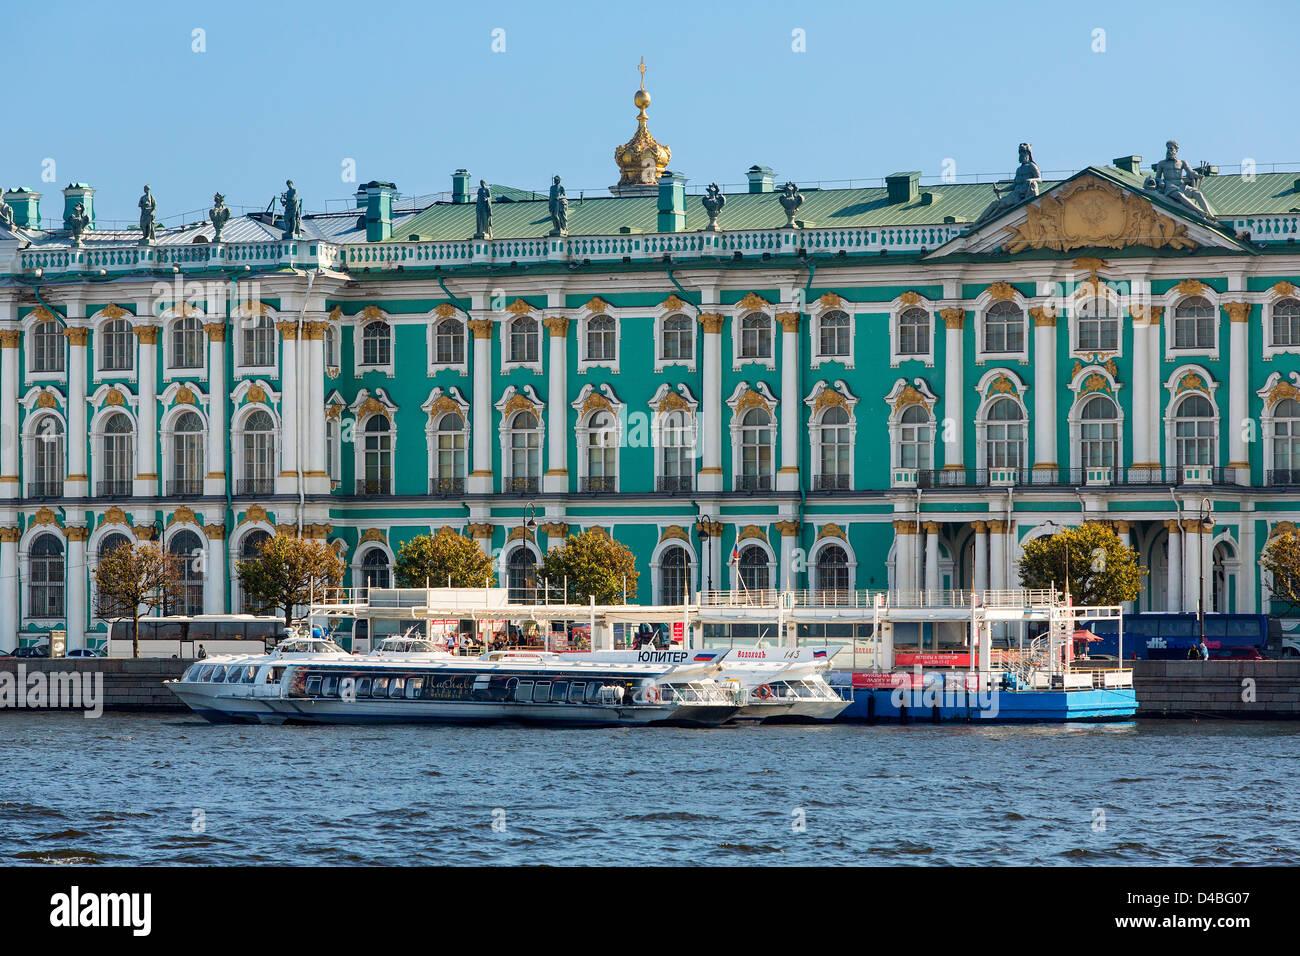 St. Petersburg, Hermitage Museum and Neva River - Stock Image